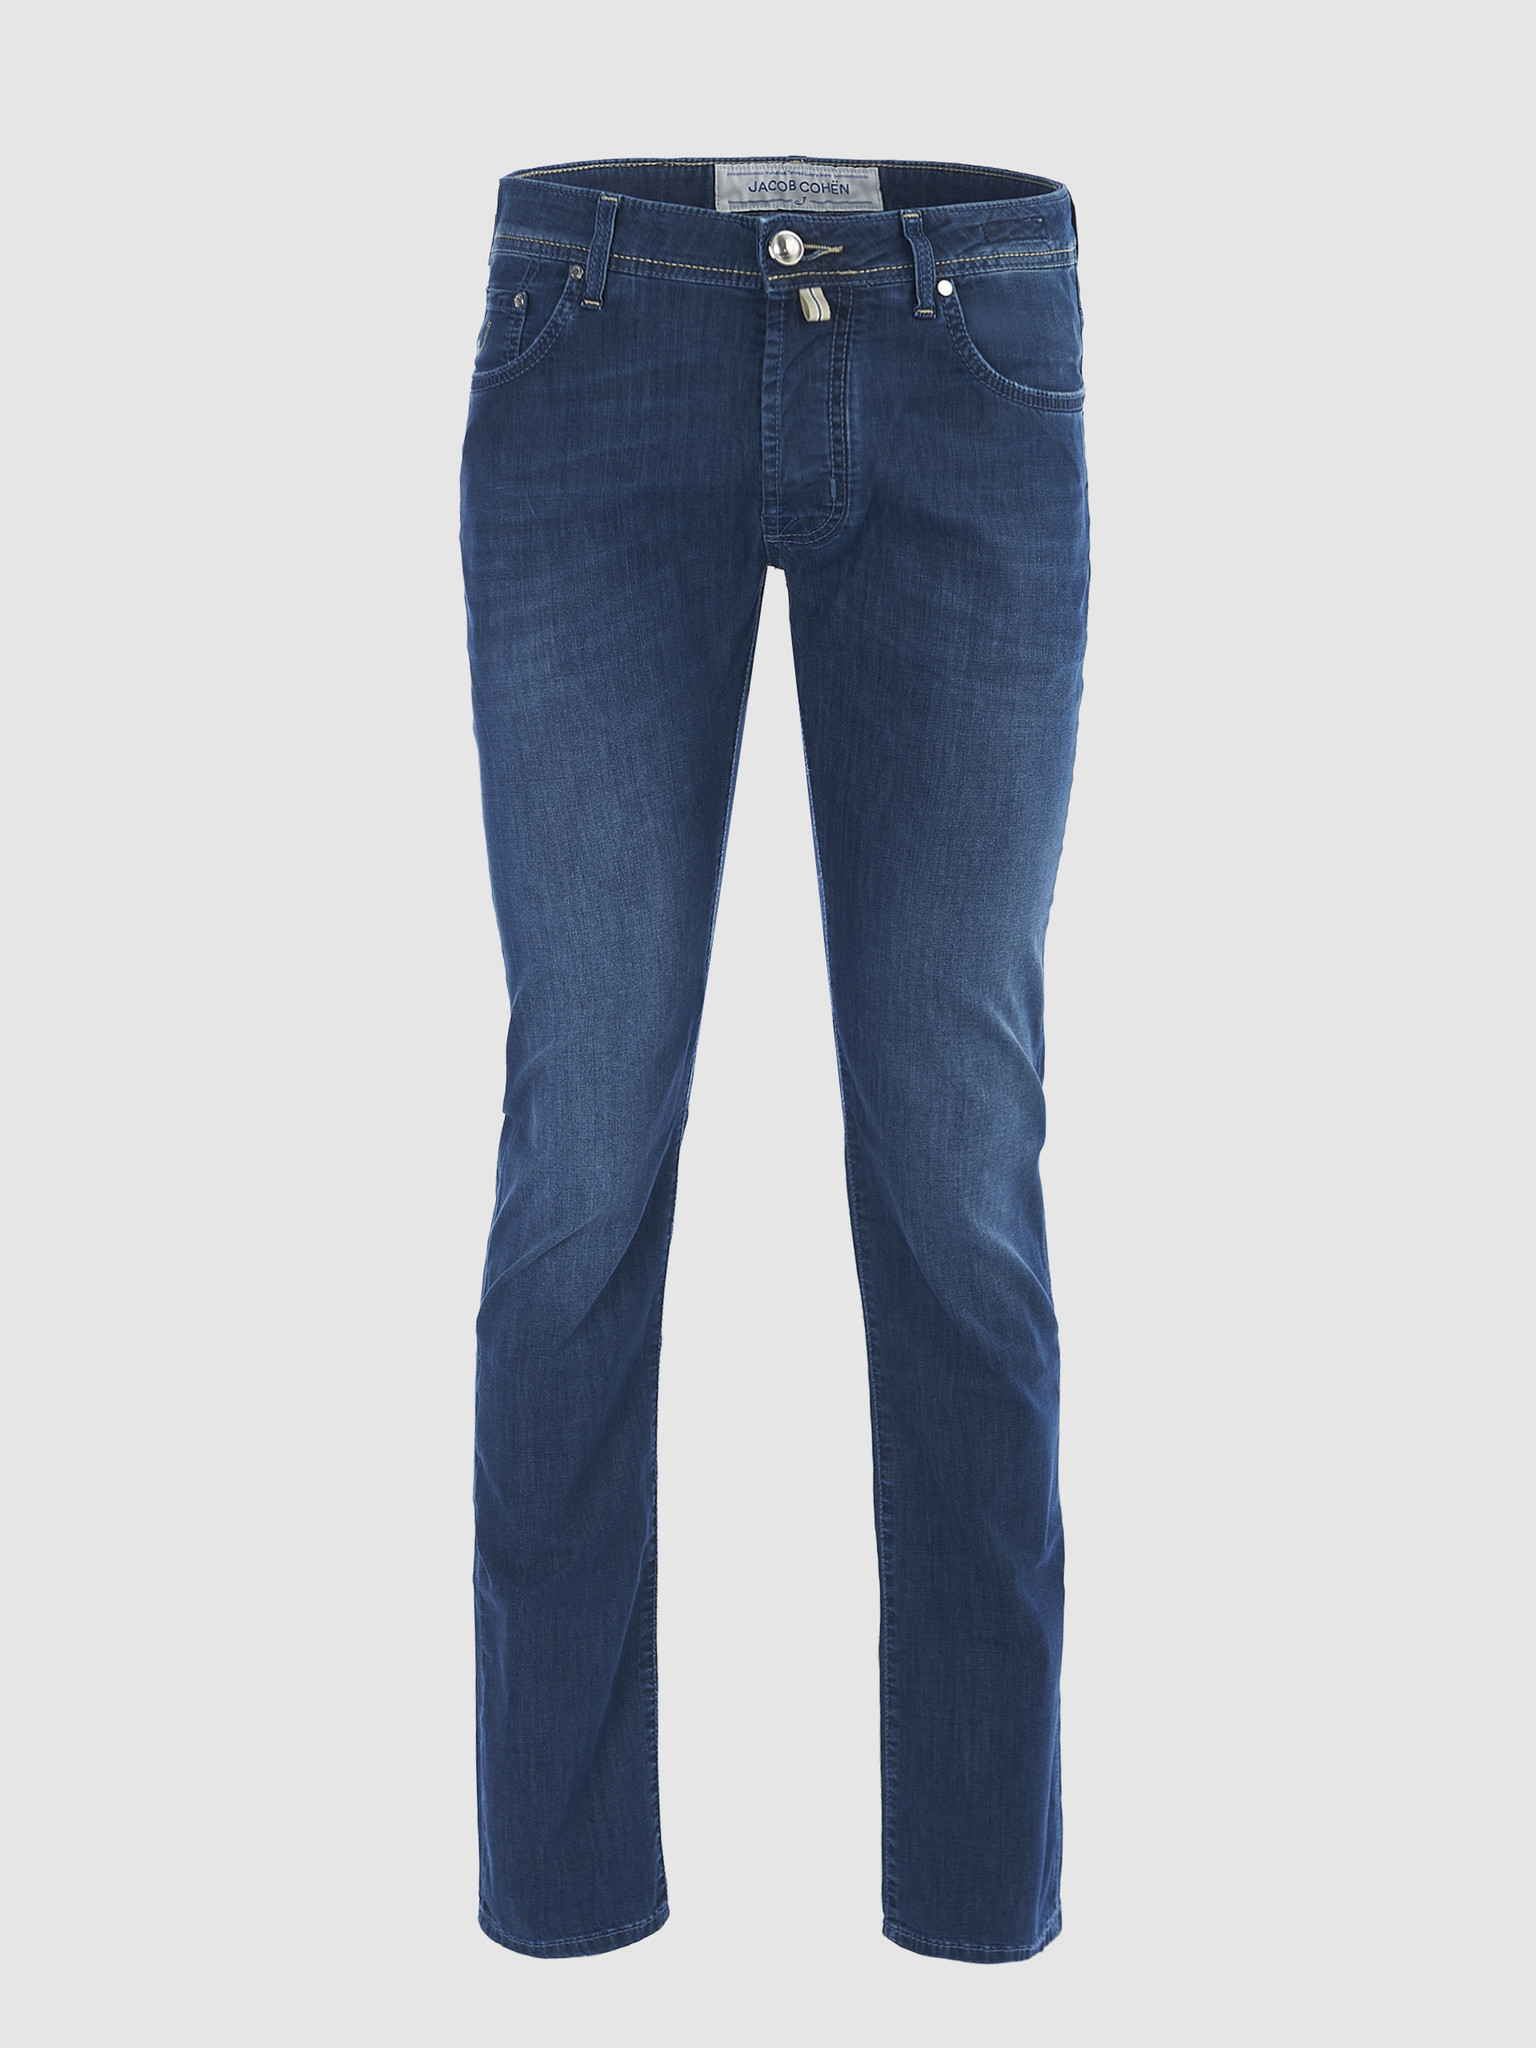 J688 Comf Jeans-1